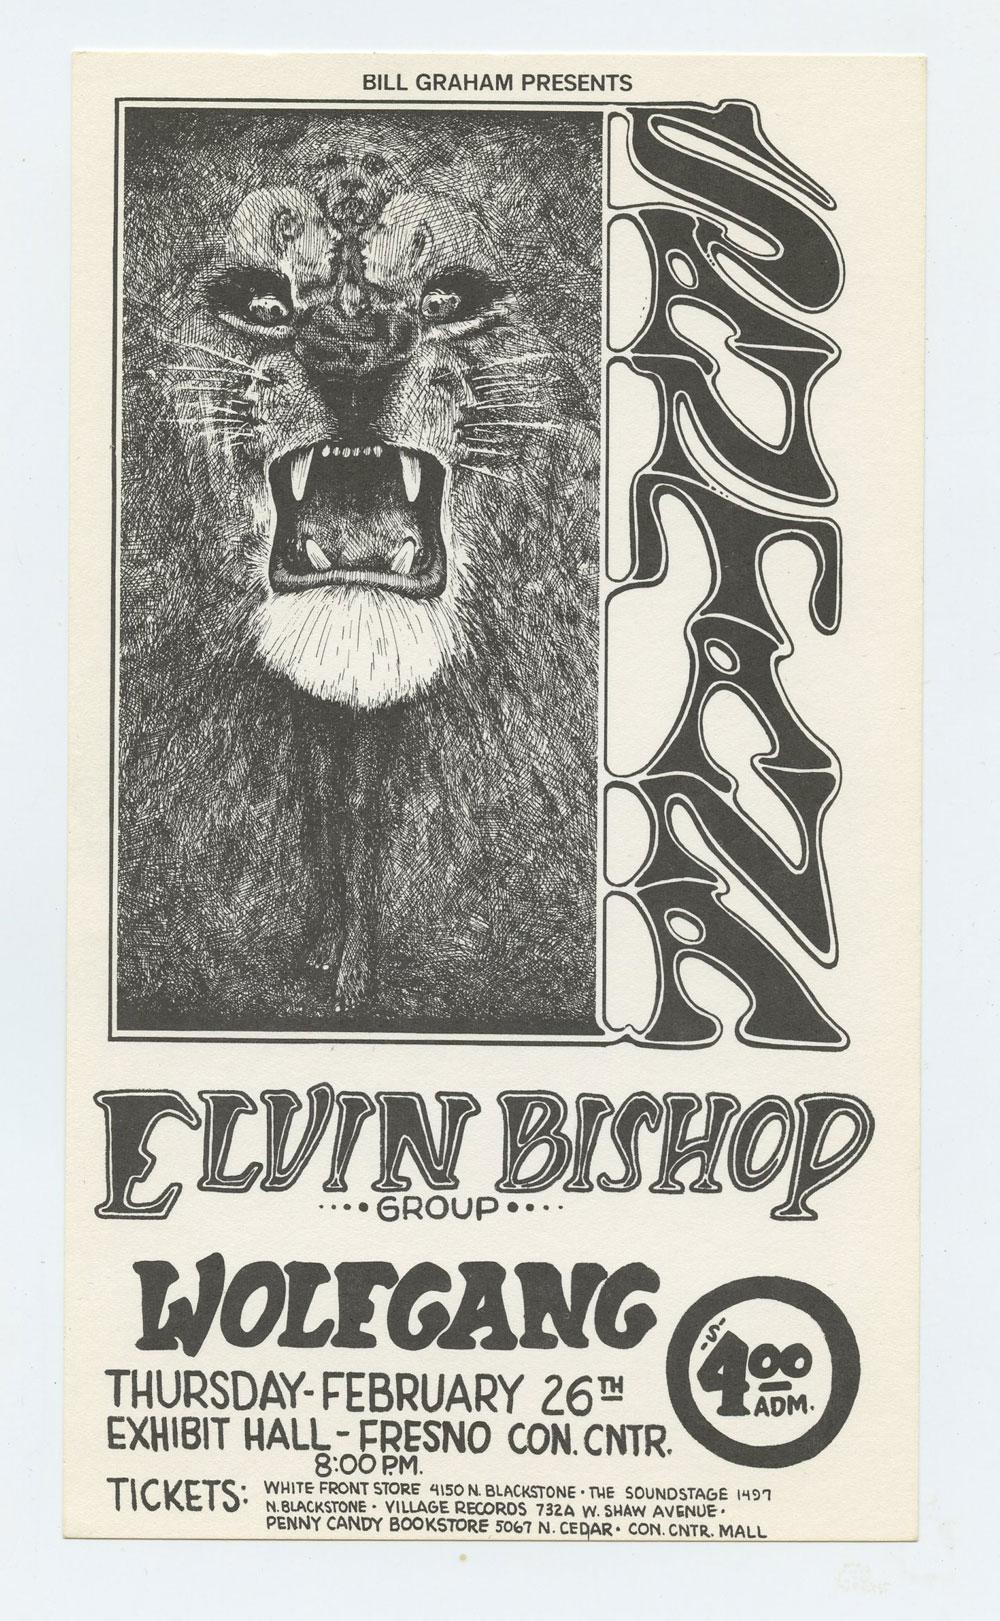 Santana Handbill 1970 Feb 26 Fresno Exhibition Hall Lee Conlkin